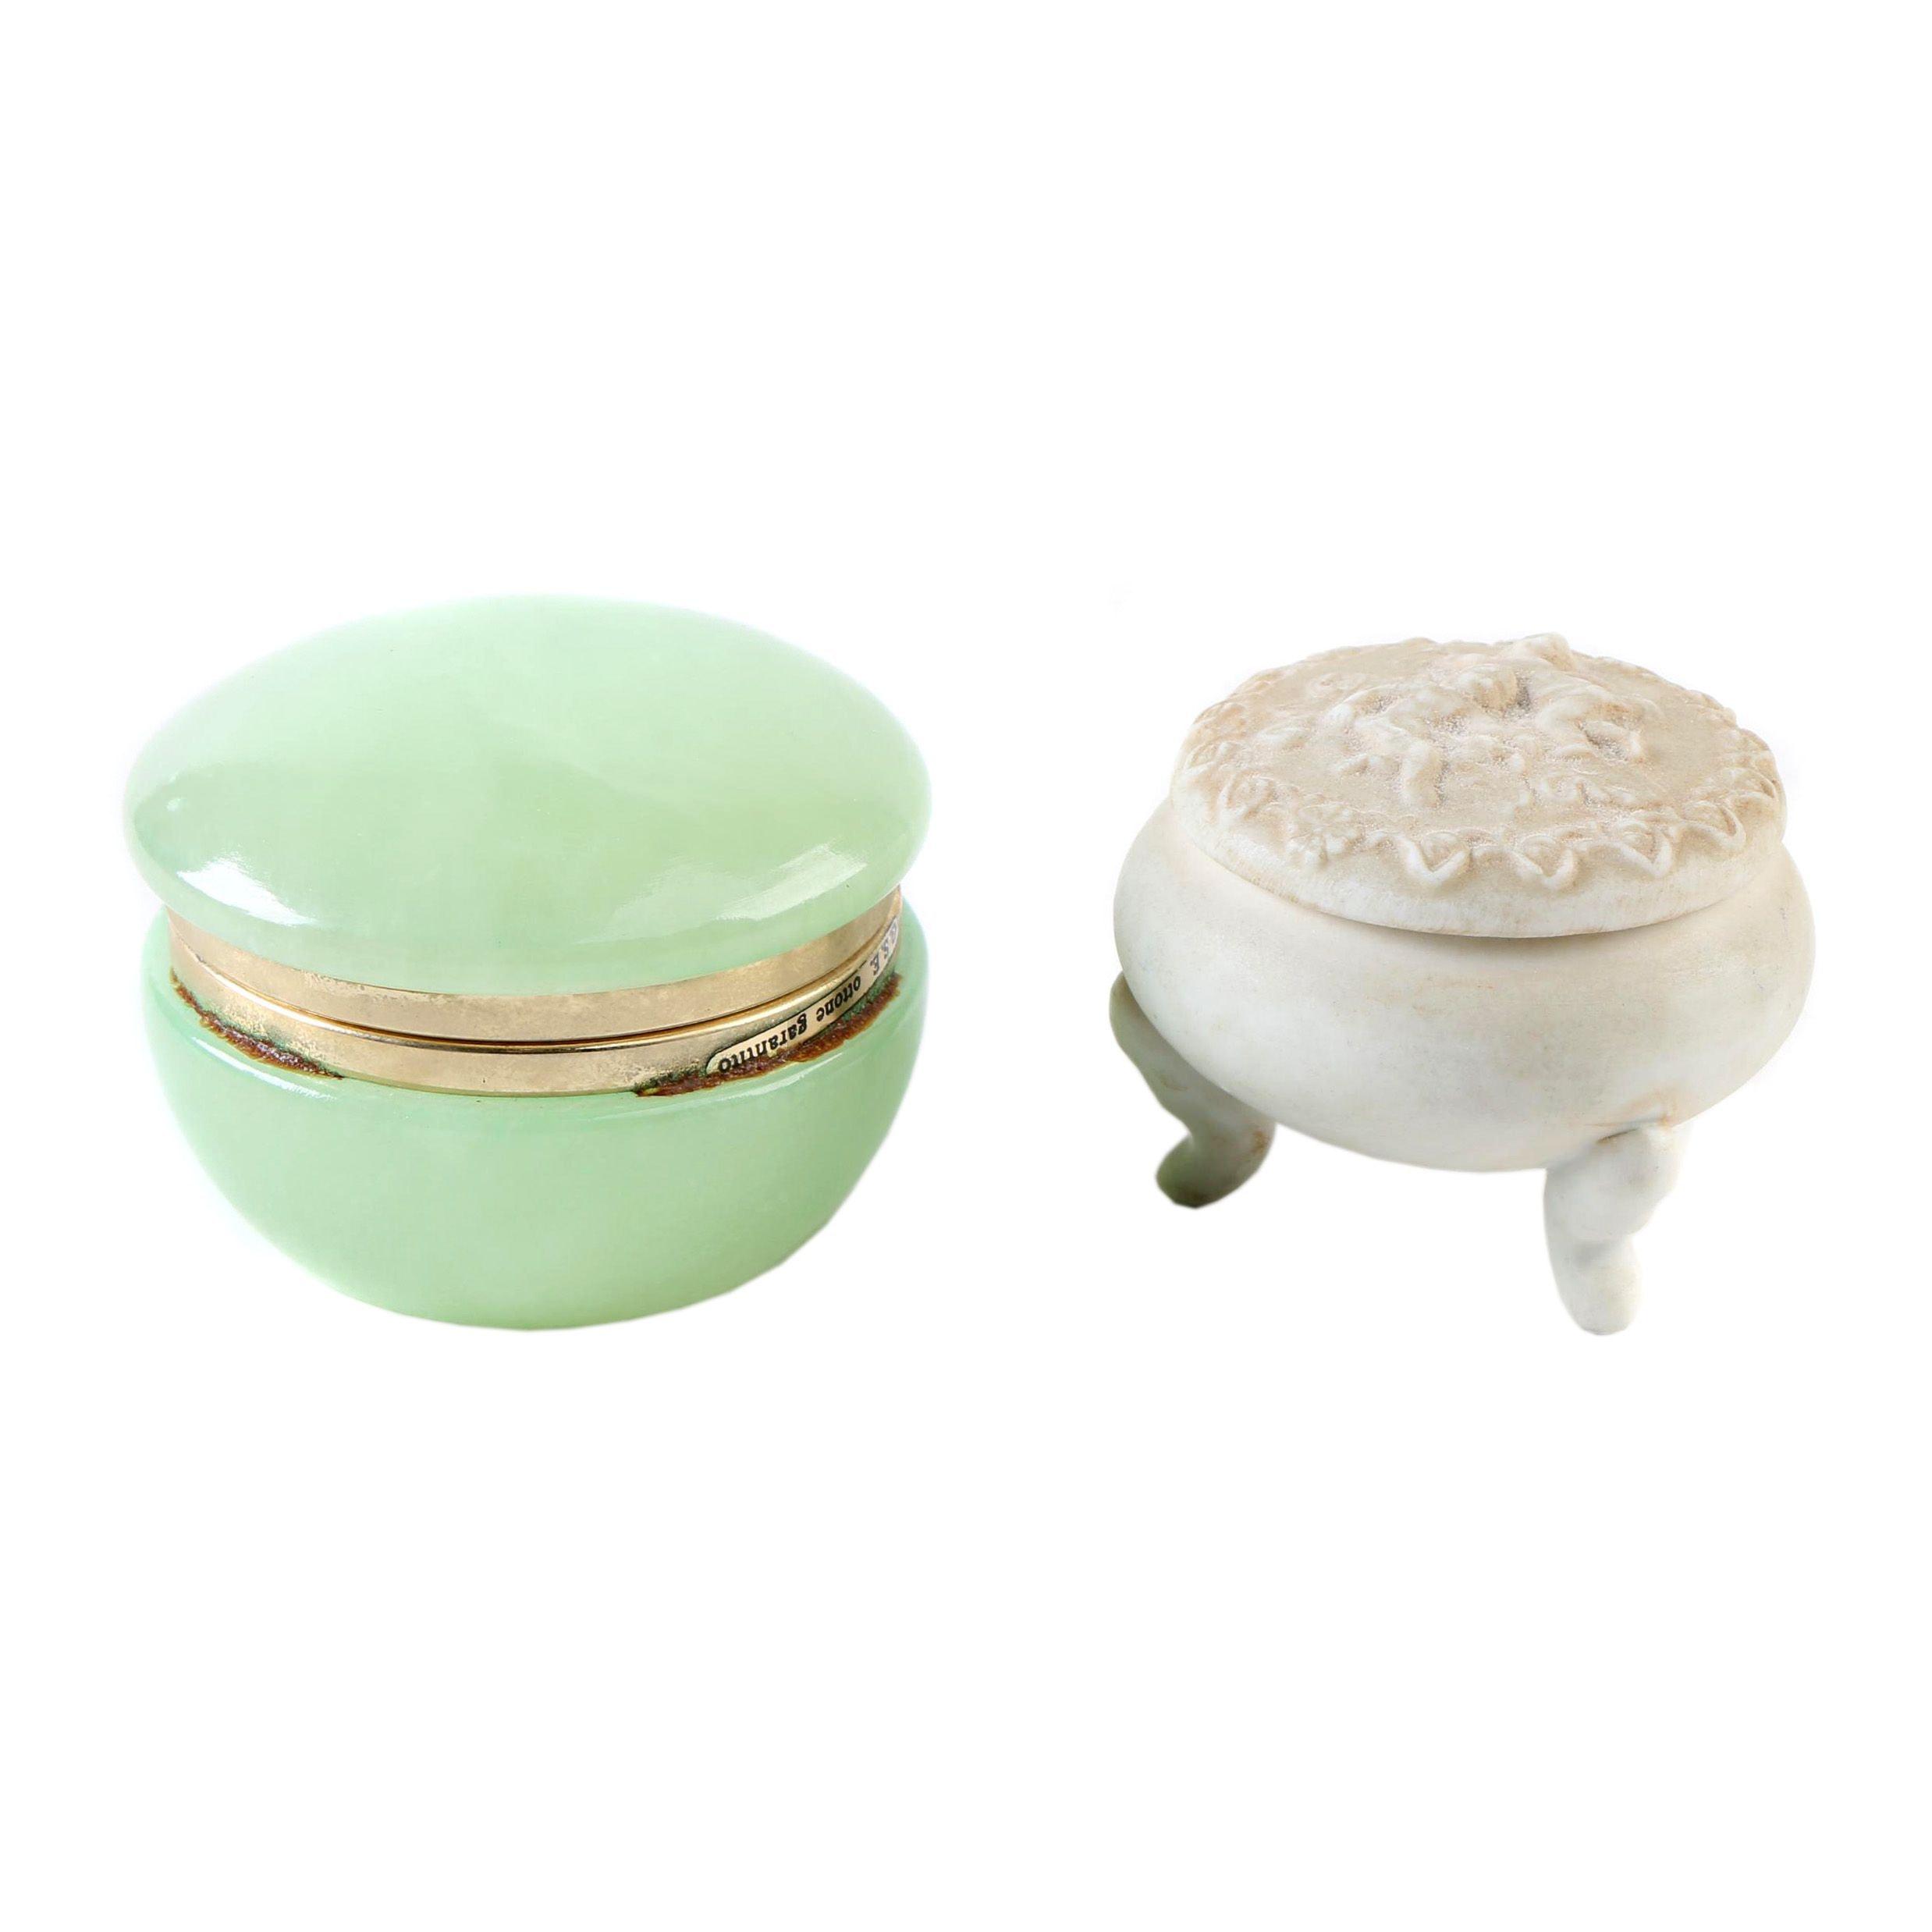 Italian GSW Ottone Garanito Trinket Box and Lefton Porcelain Trinket Box